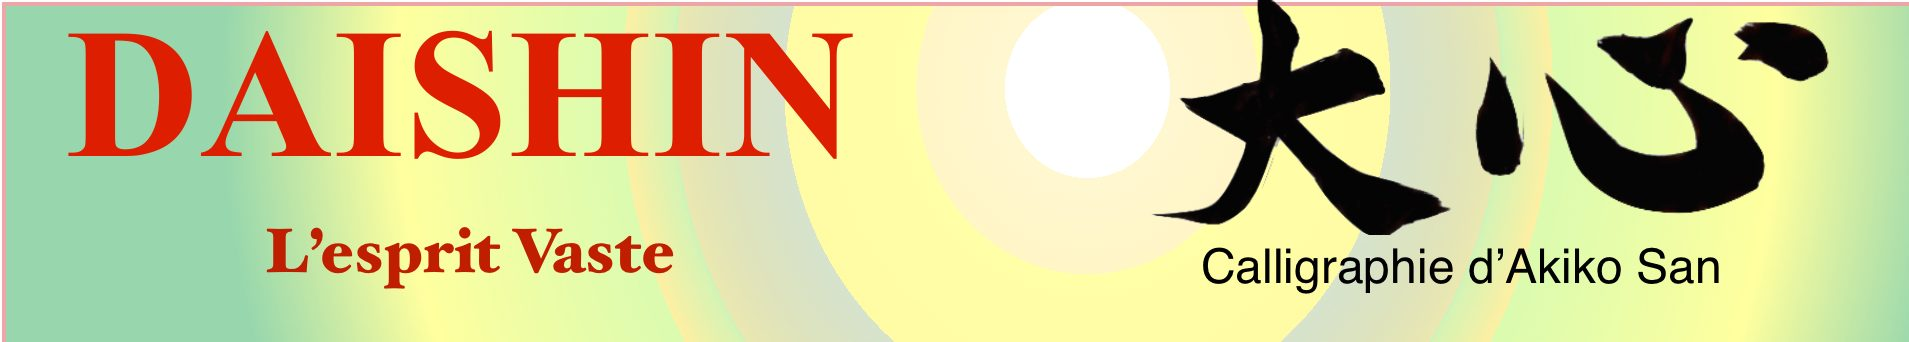 cropped-60433959-A844-42C1-BD63-2AE5BC319669.jpeg